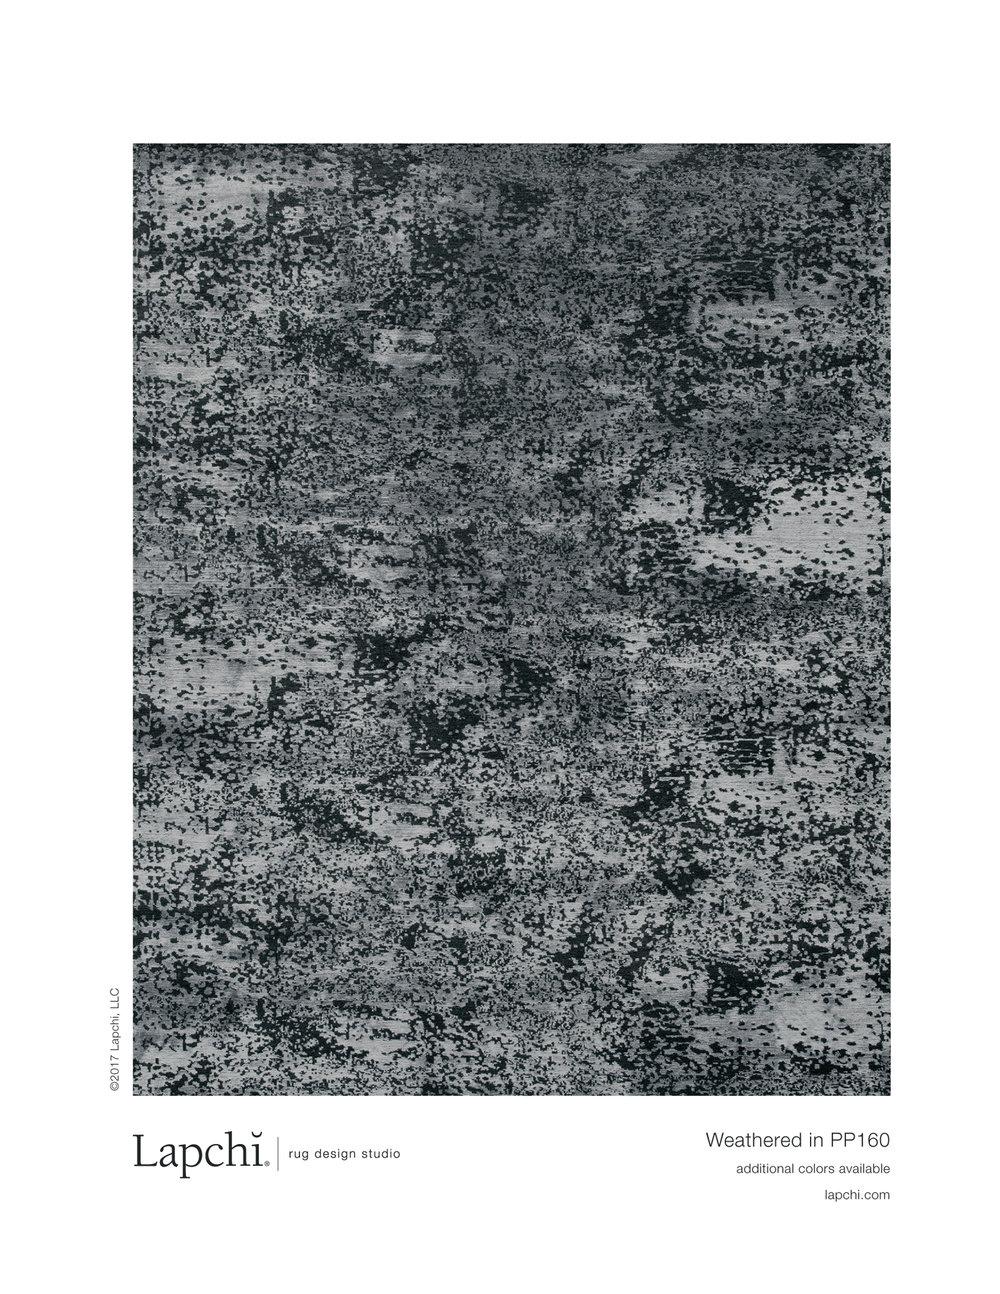 Weathered area rug from Lapchi rug design studio.